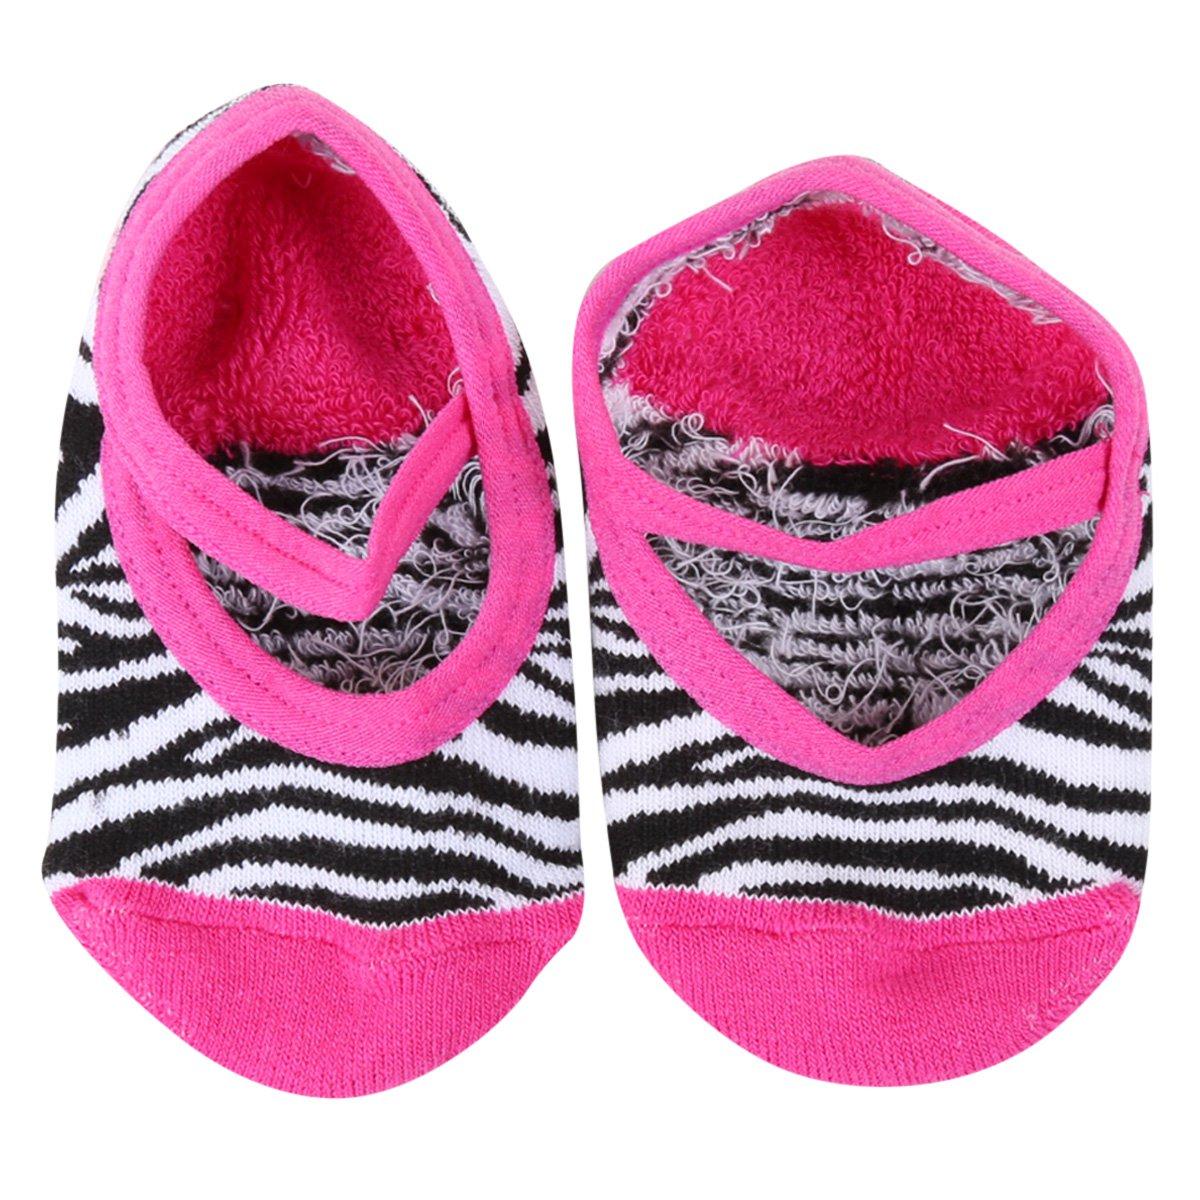 Meia Infantil Cia da Meia Sapatilha Antiderrapante Zebra Feminina